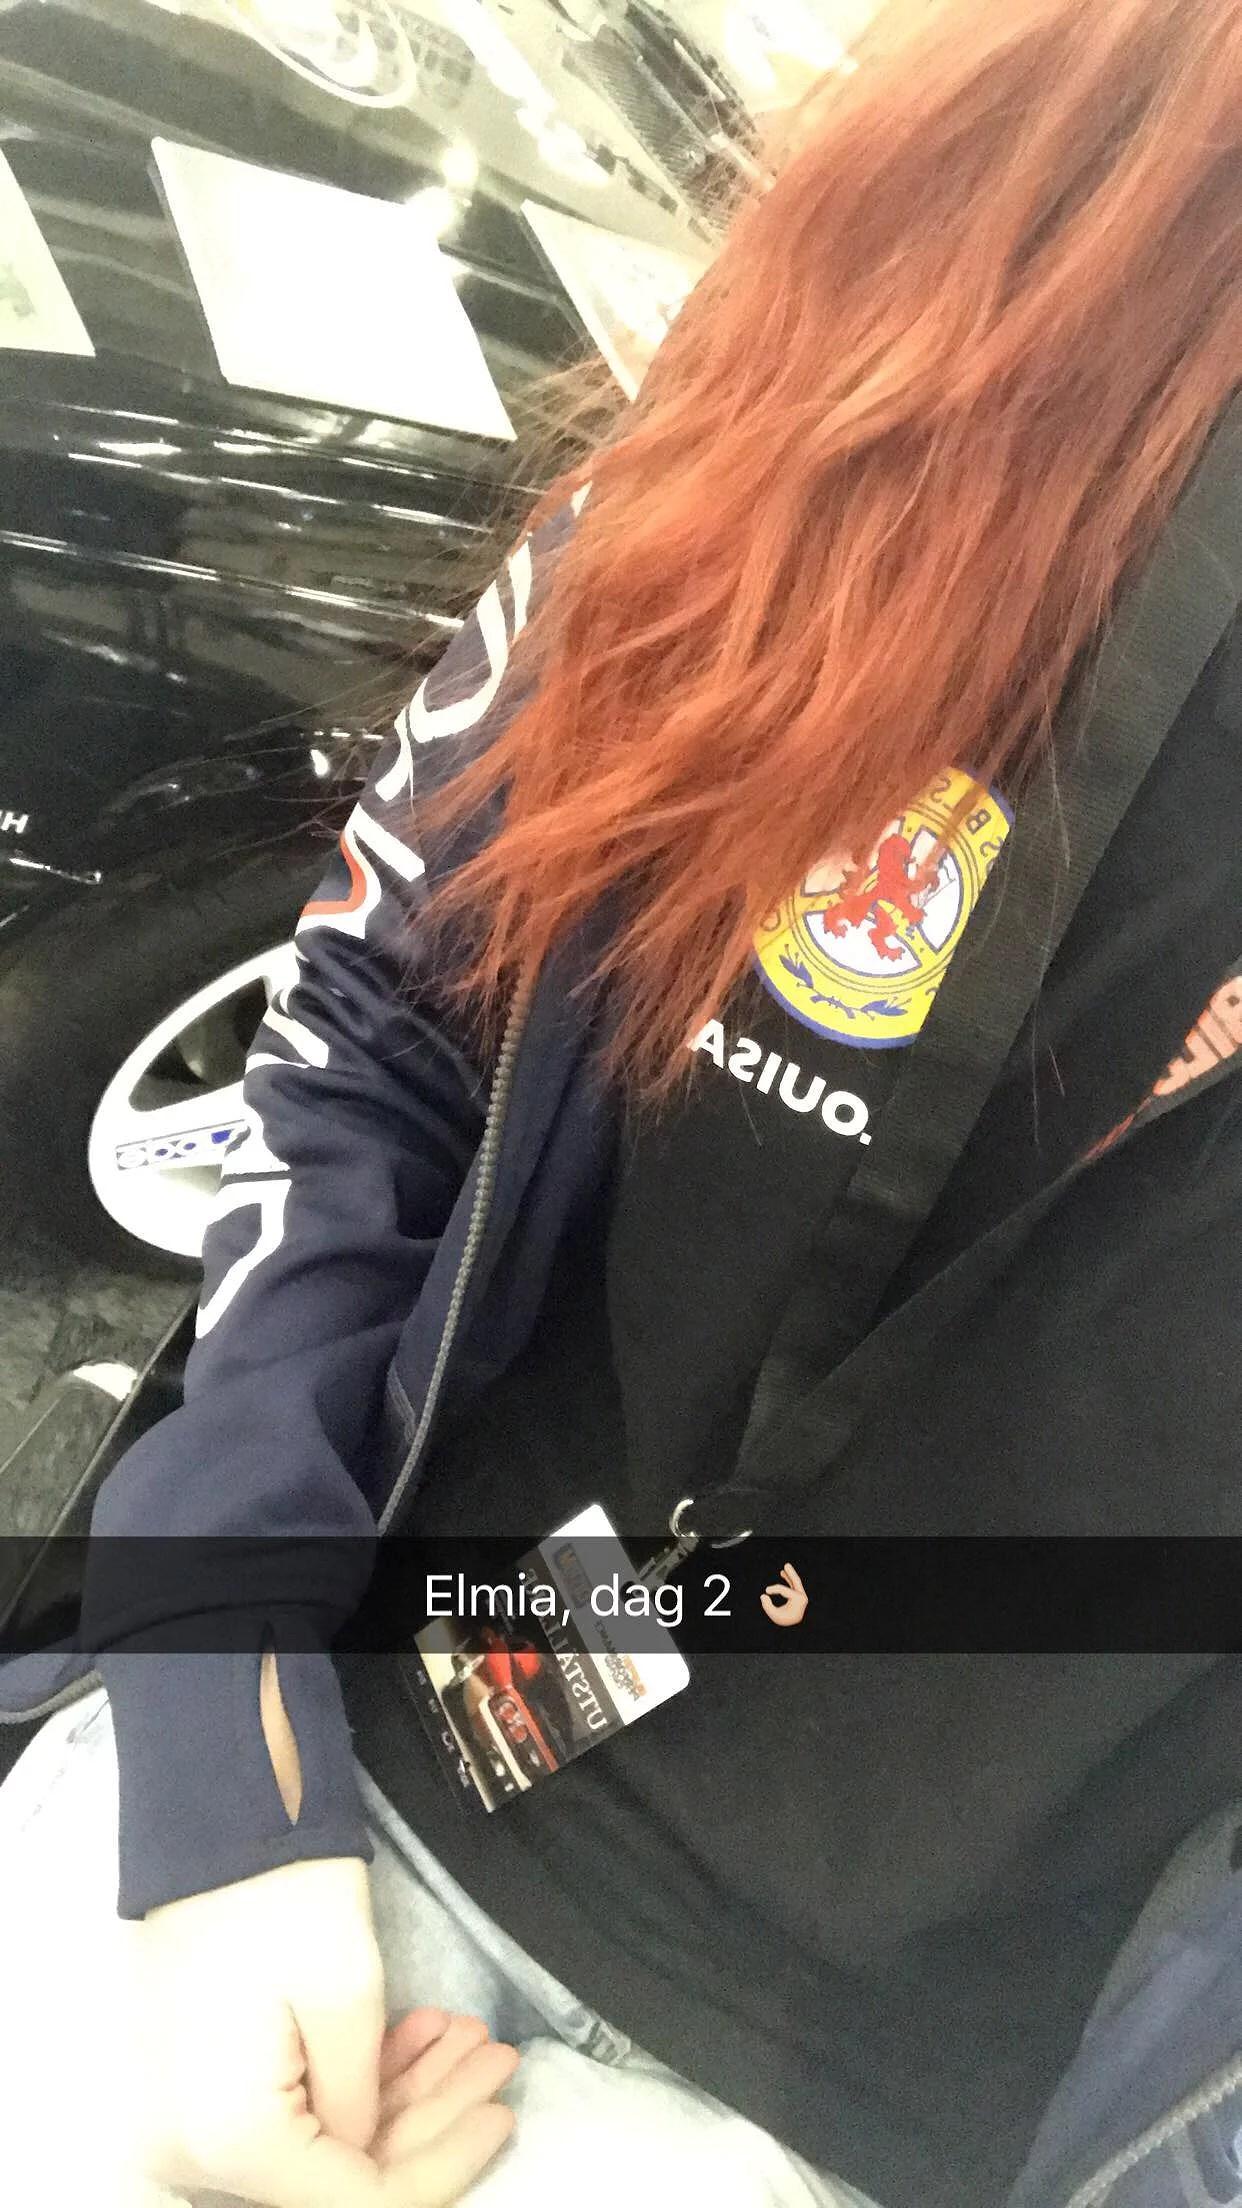 Elmia Dag 2